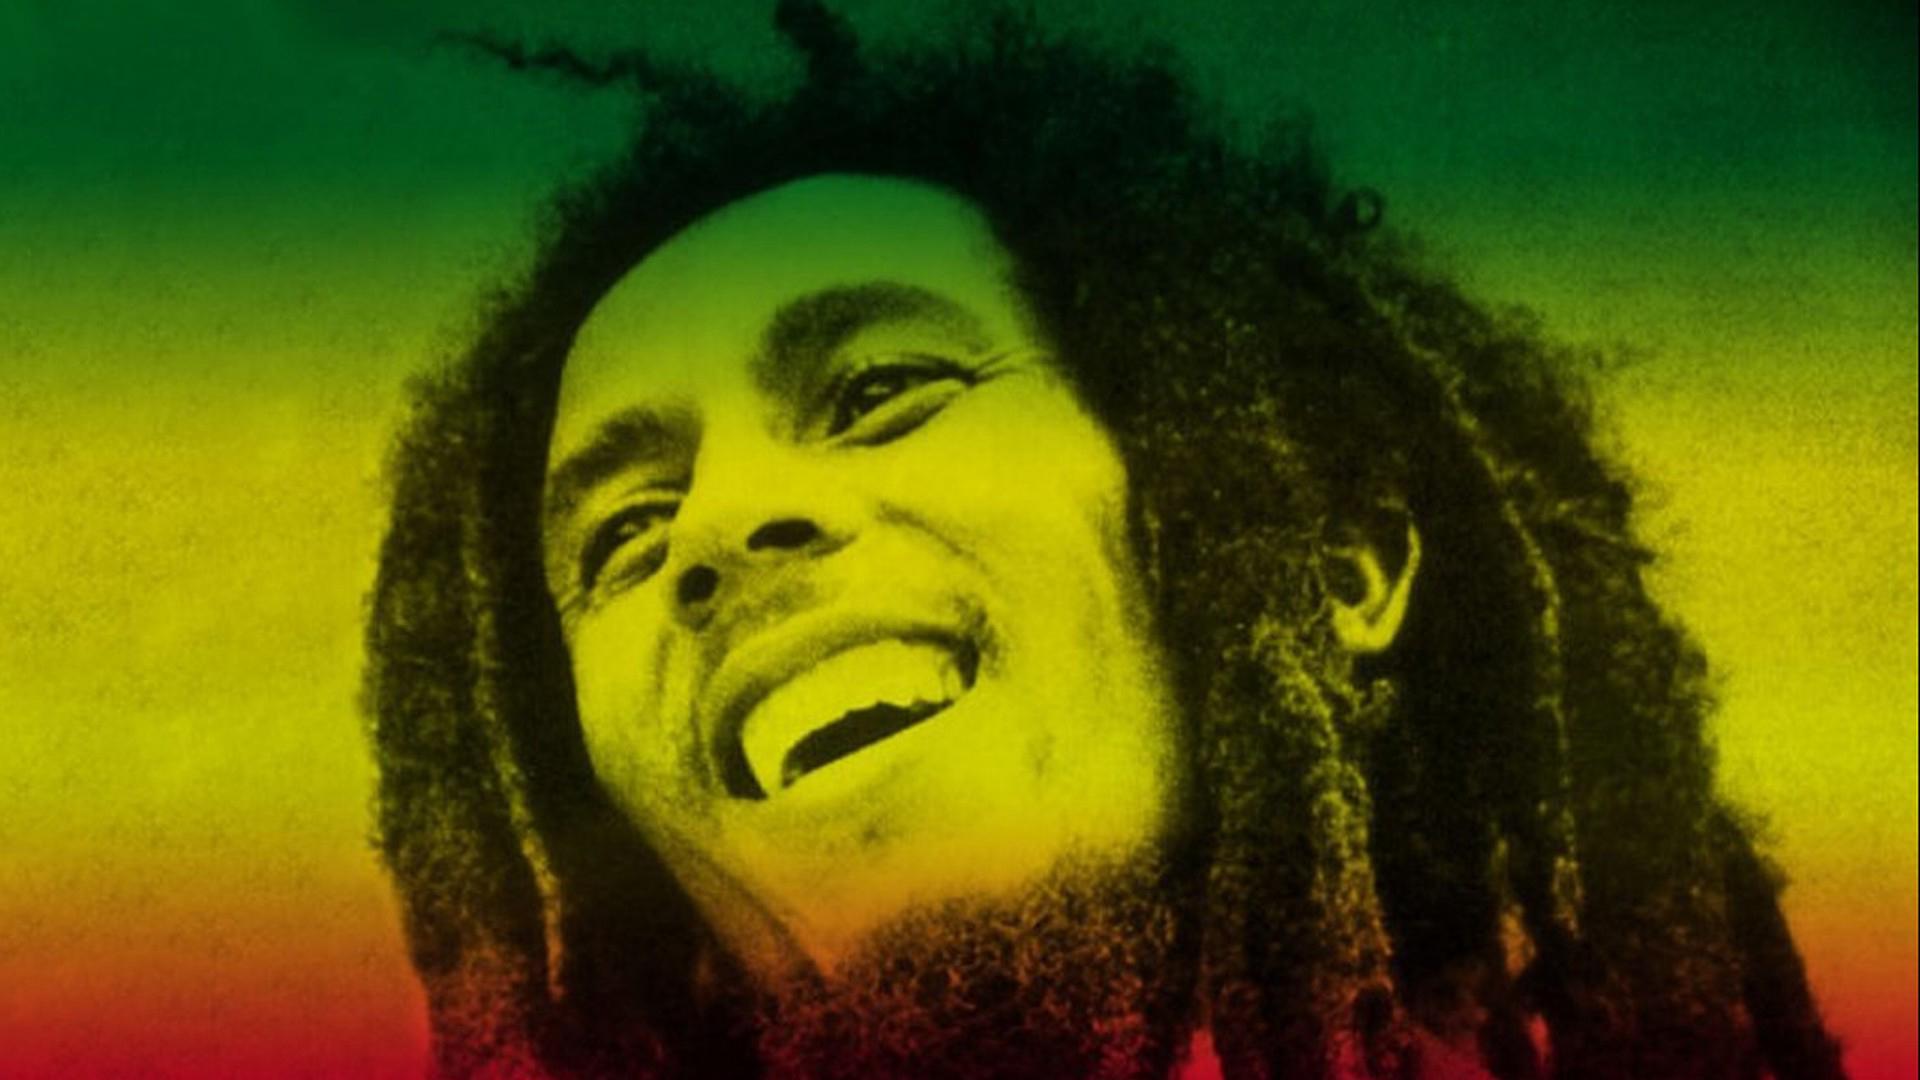 Bob Marley HD Wallpapers | Hd Wallpapers